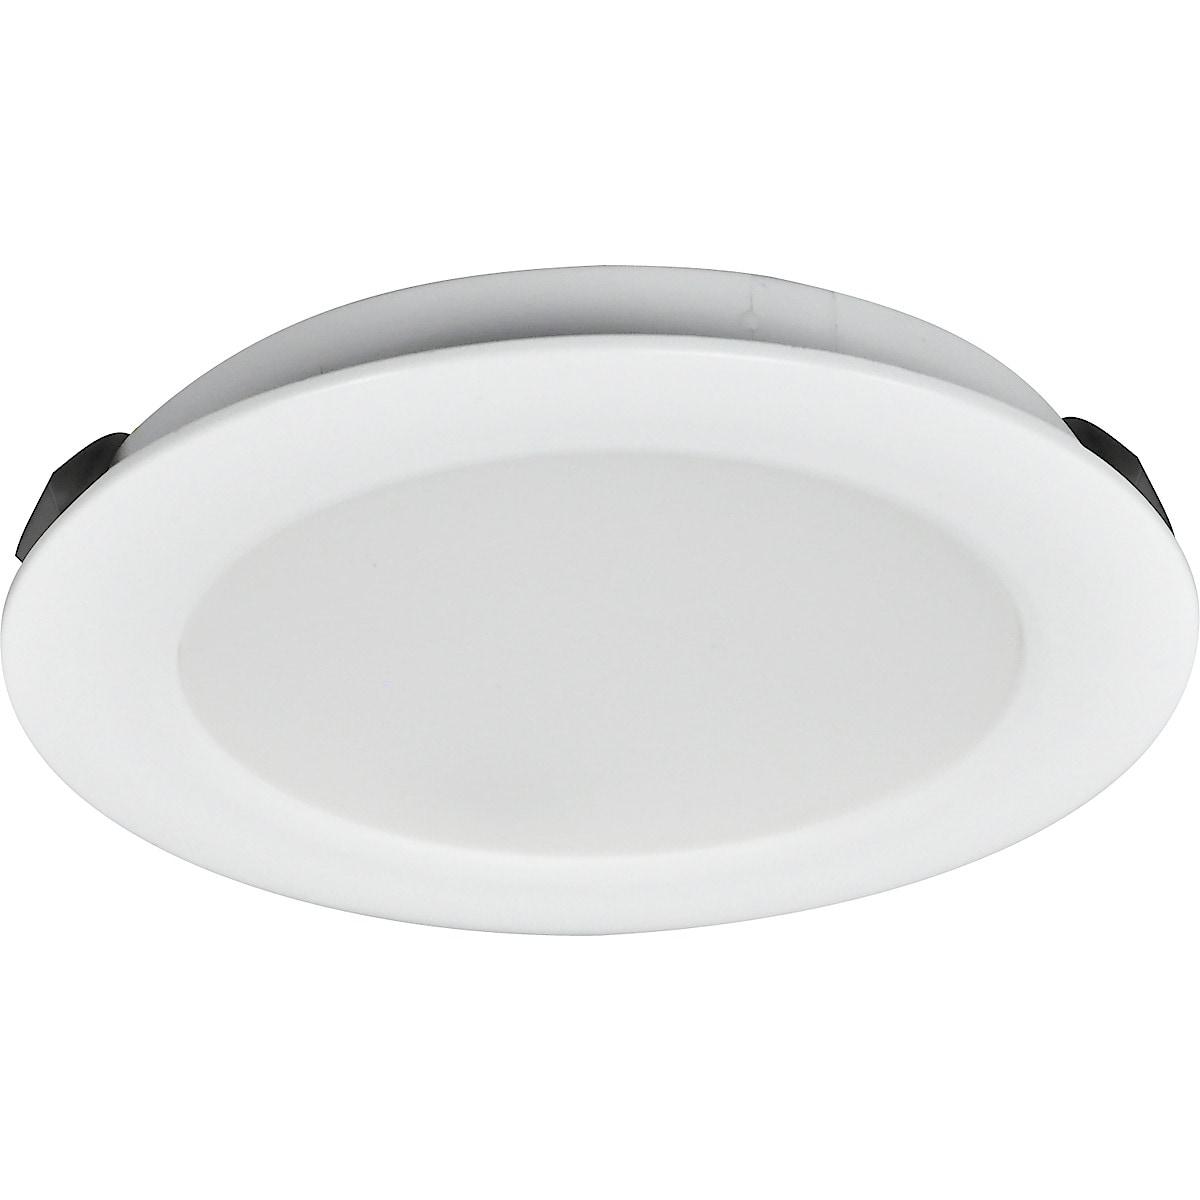 Kohdevalo LED3 kpl, Cotech